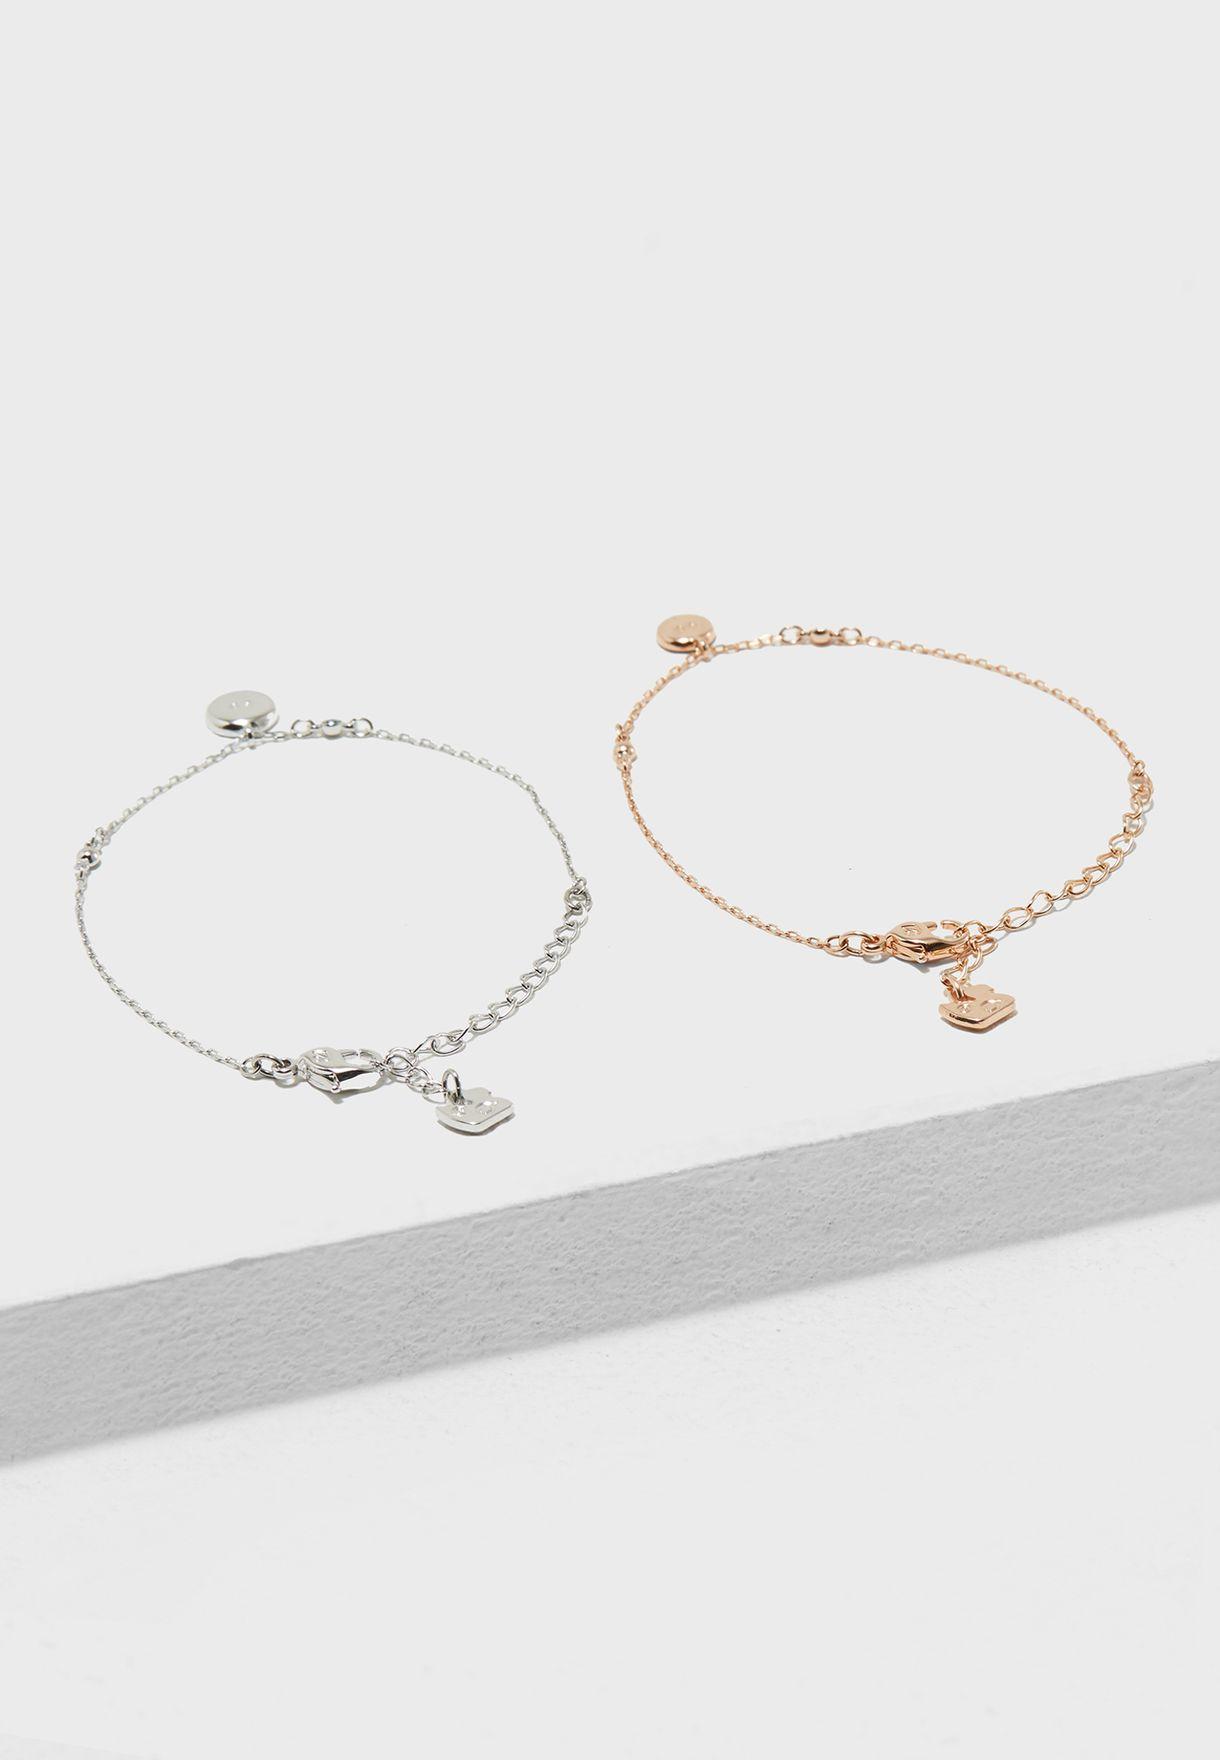 005f6f91ae7 Shop Swarovski multicolor Crystal Wishes Evil Eye Bracelet Set ...